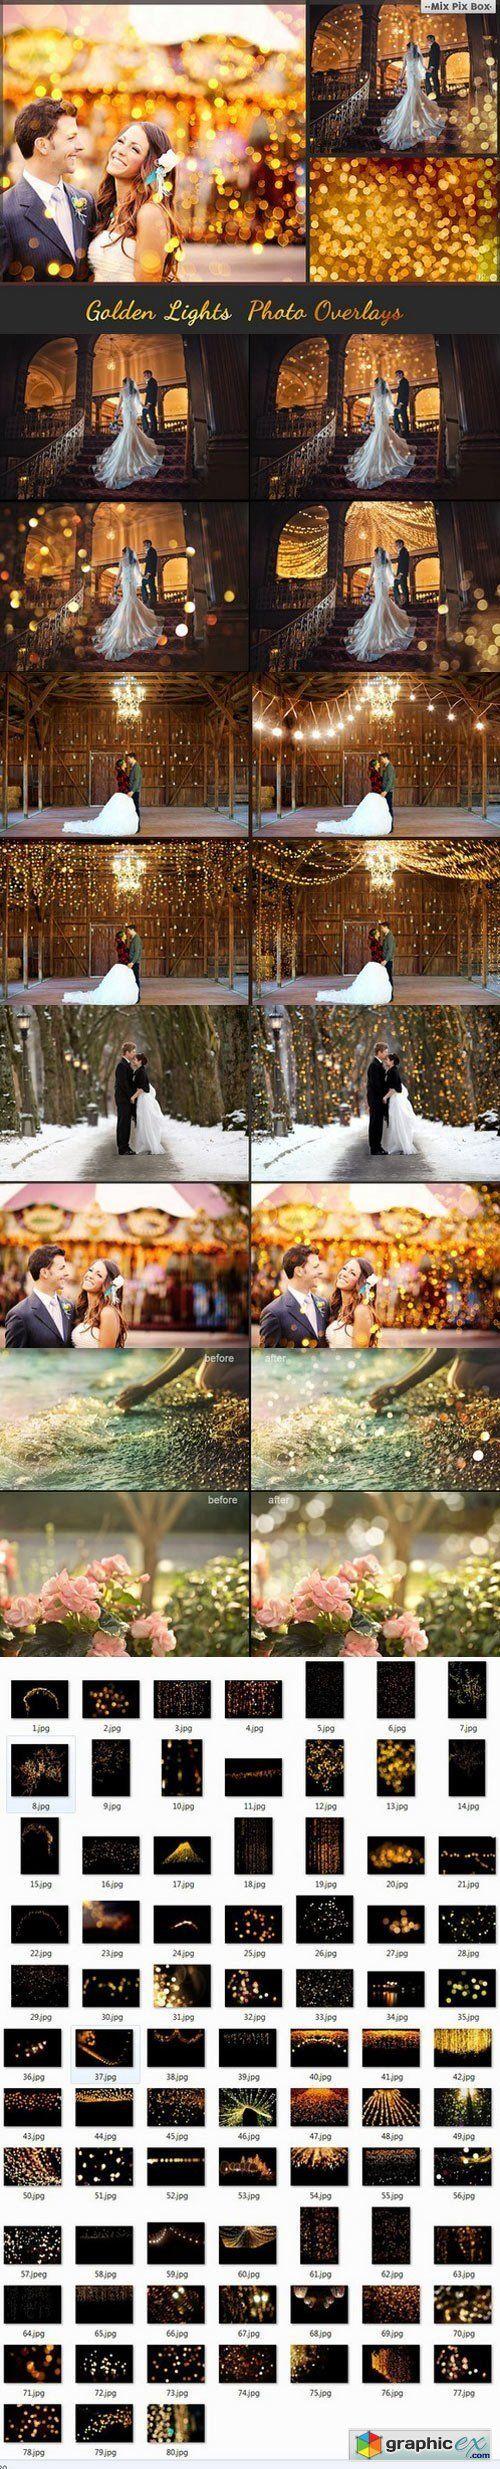 80 Golden lights Photo Overlays